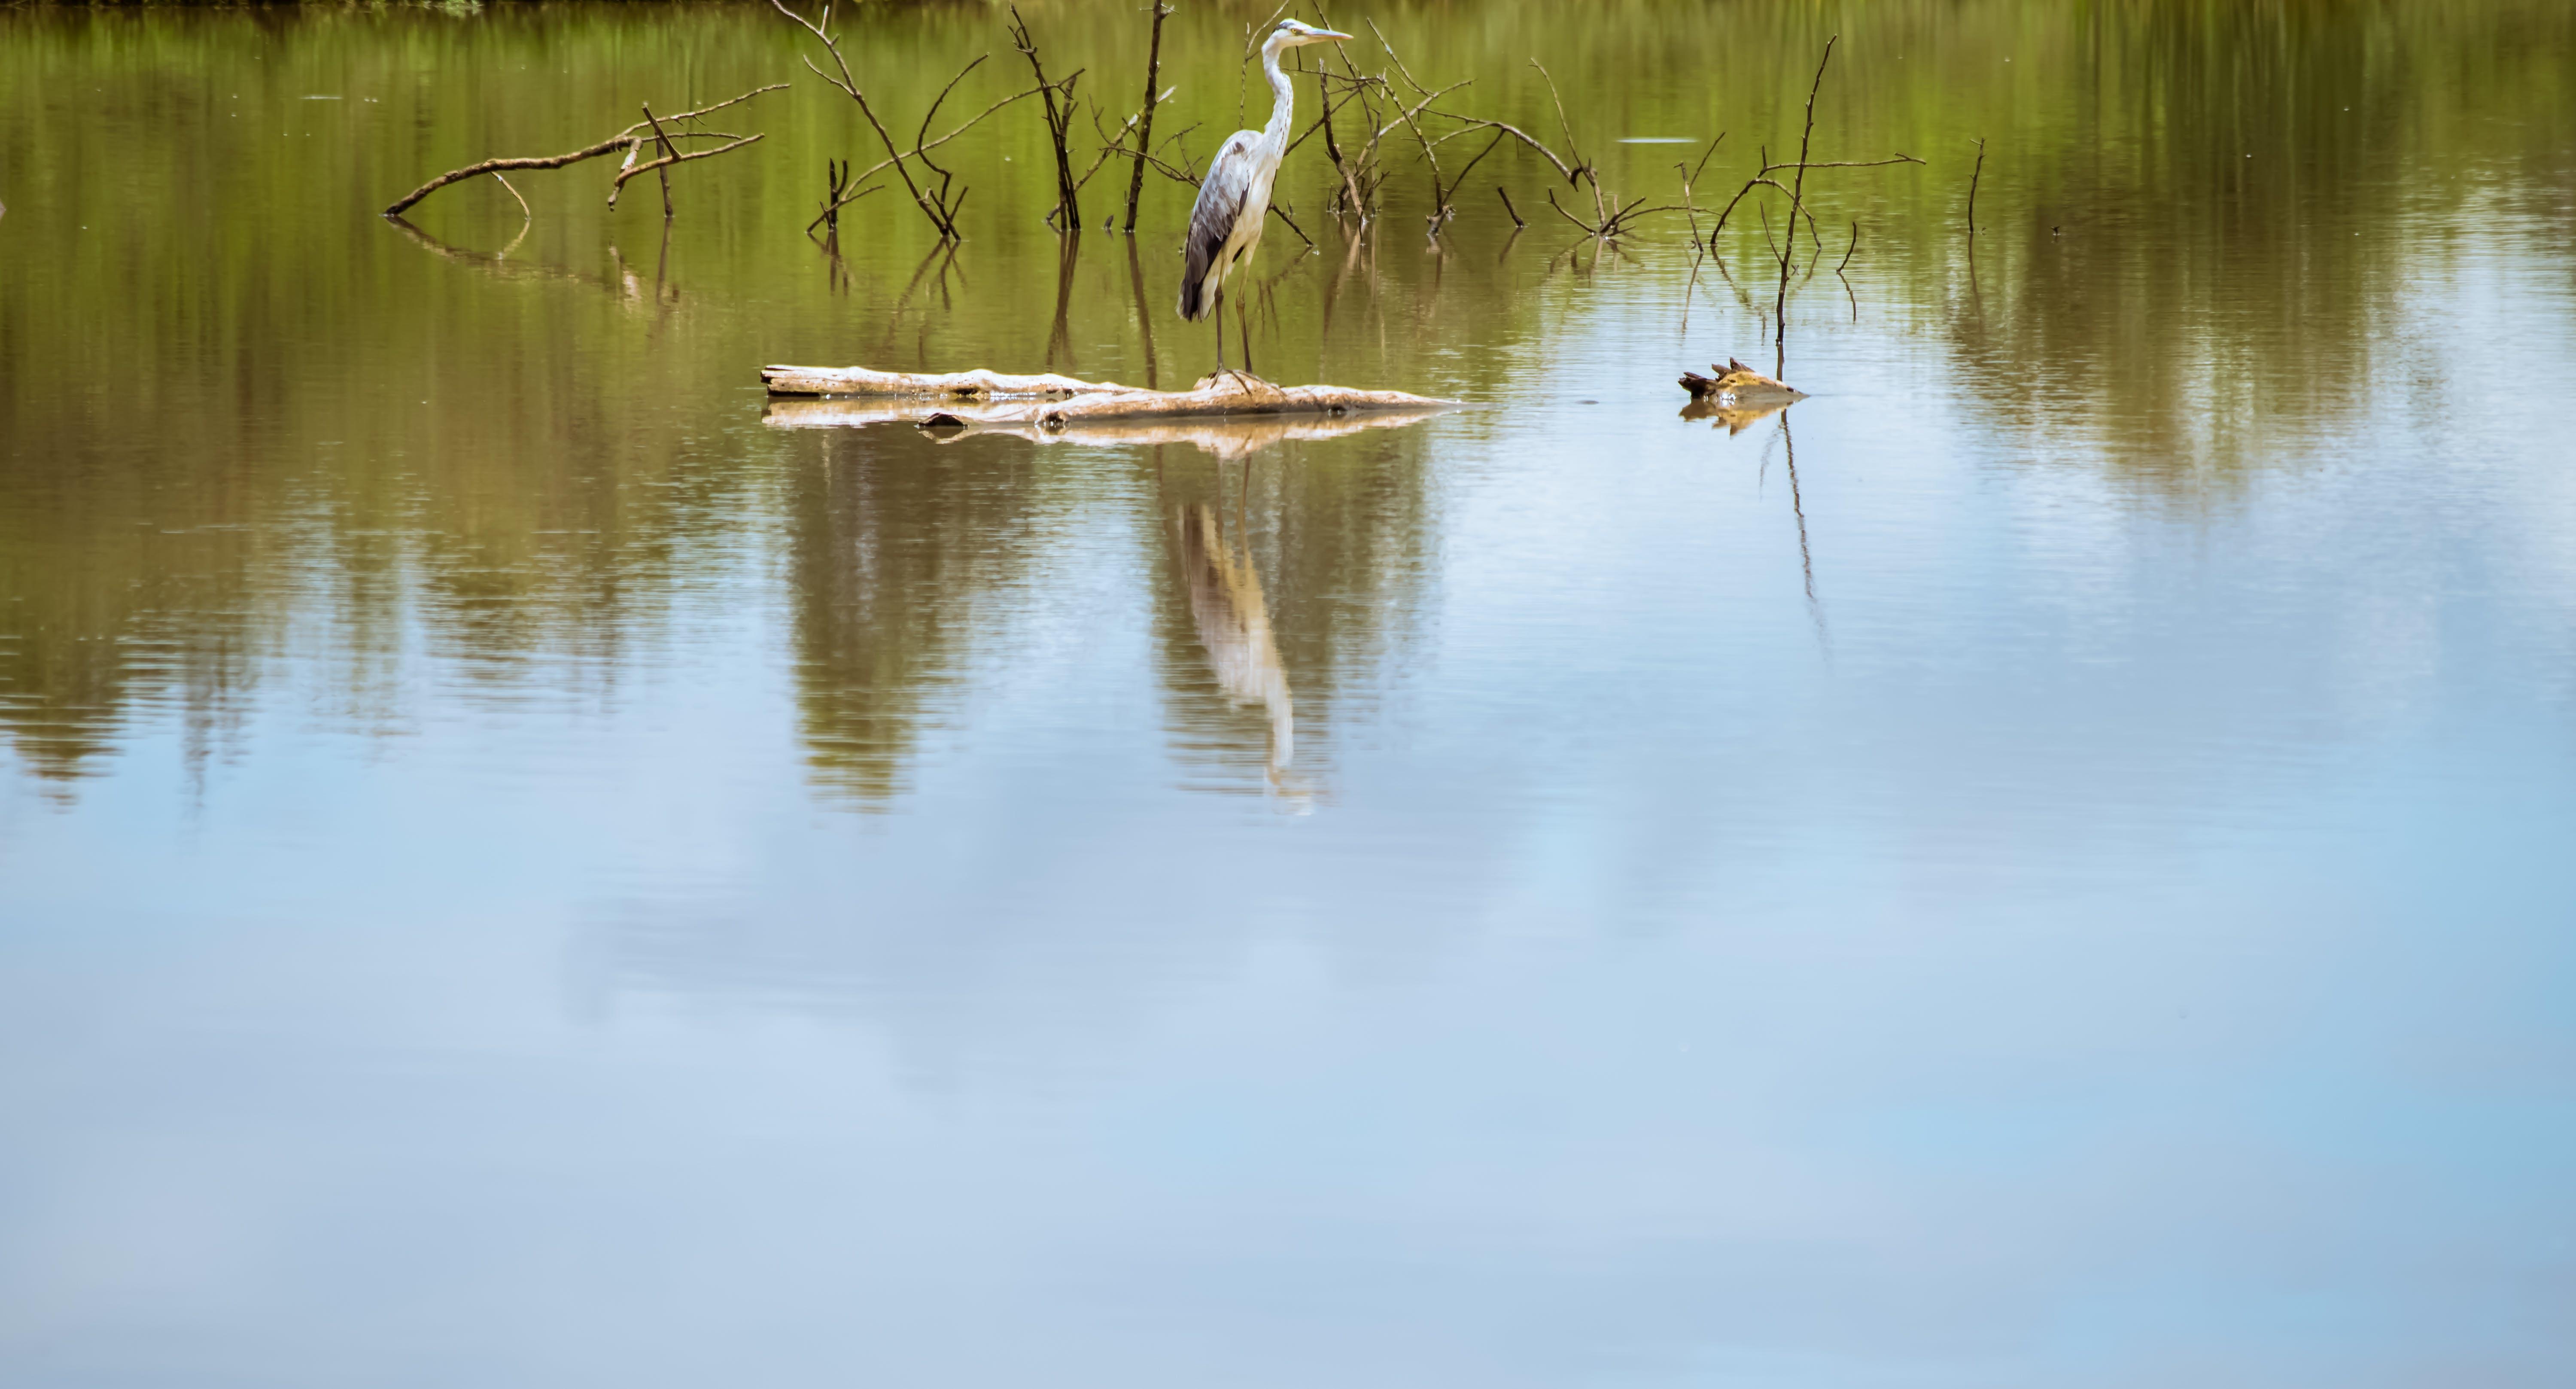 Free stock photo of Blue heron, lake, pond, swamp